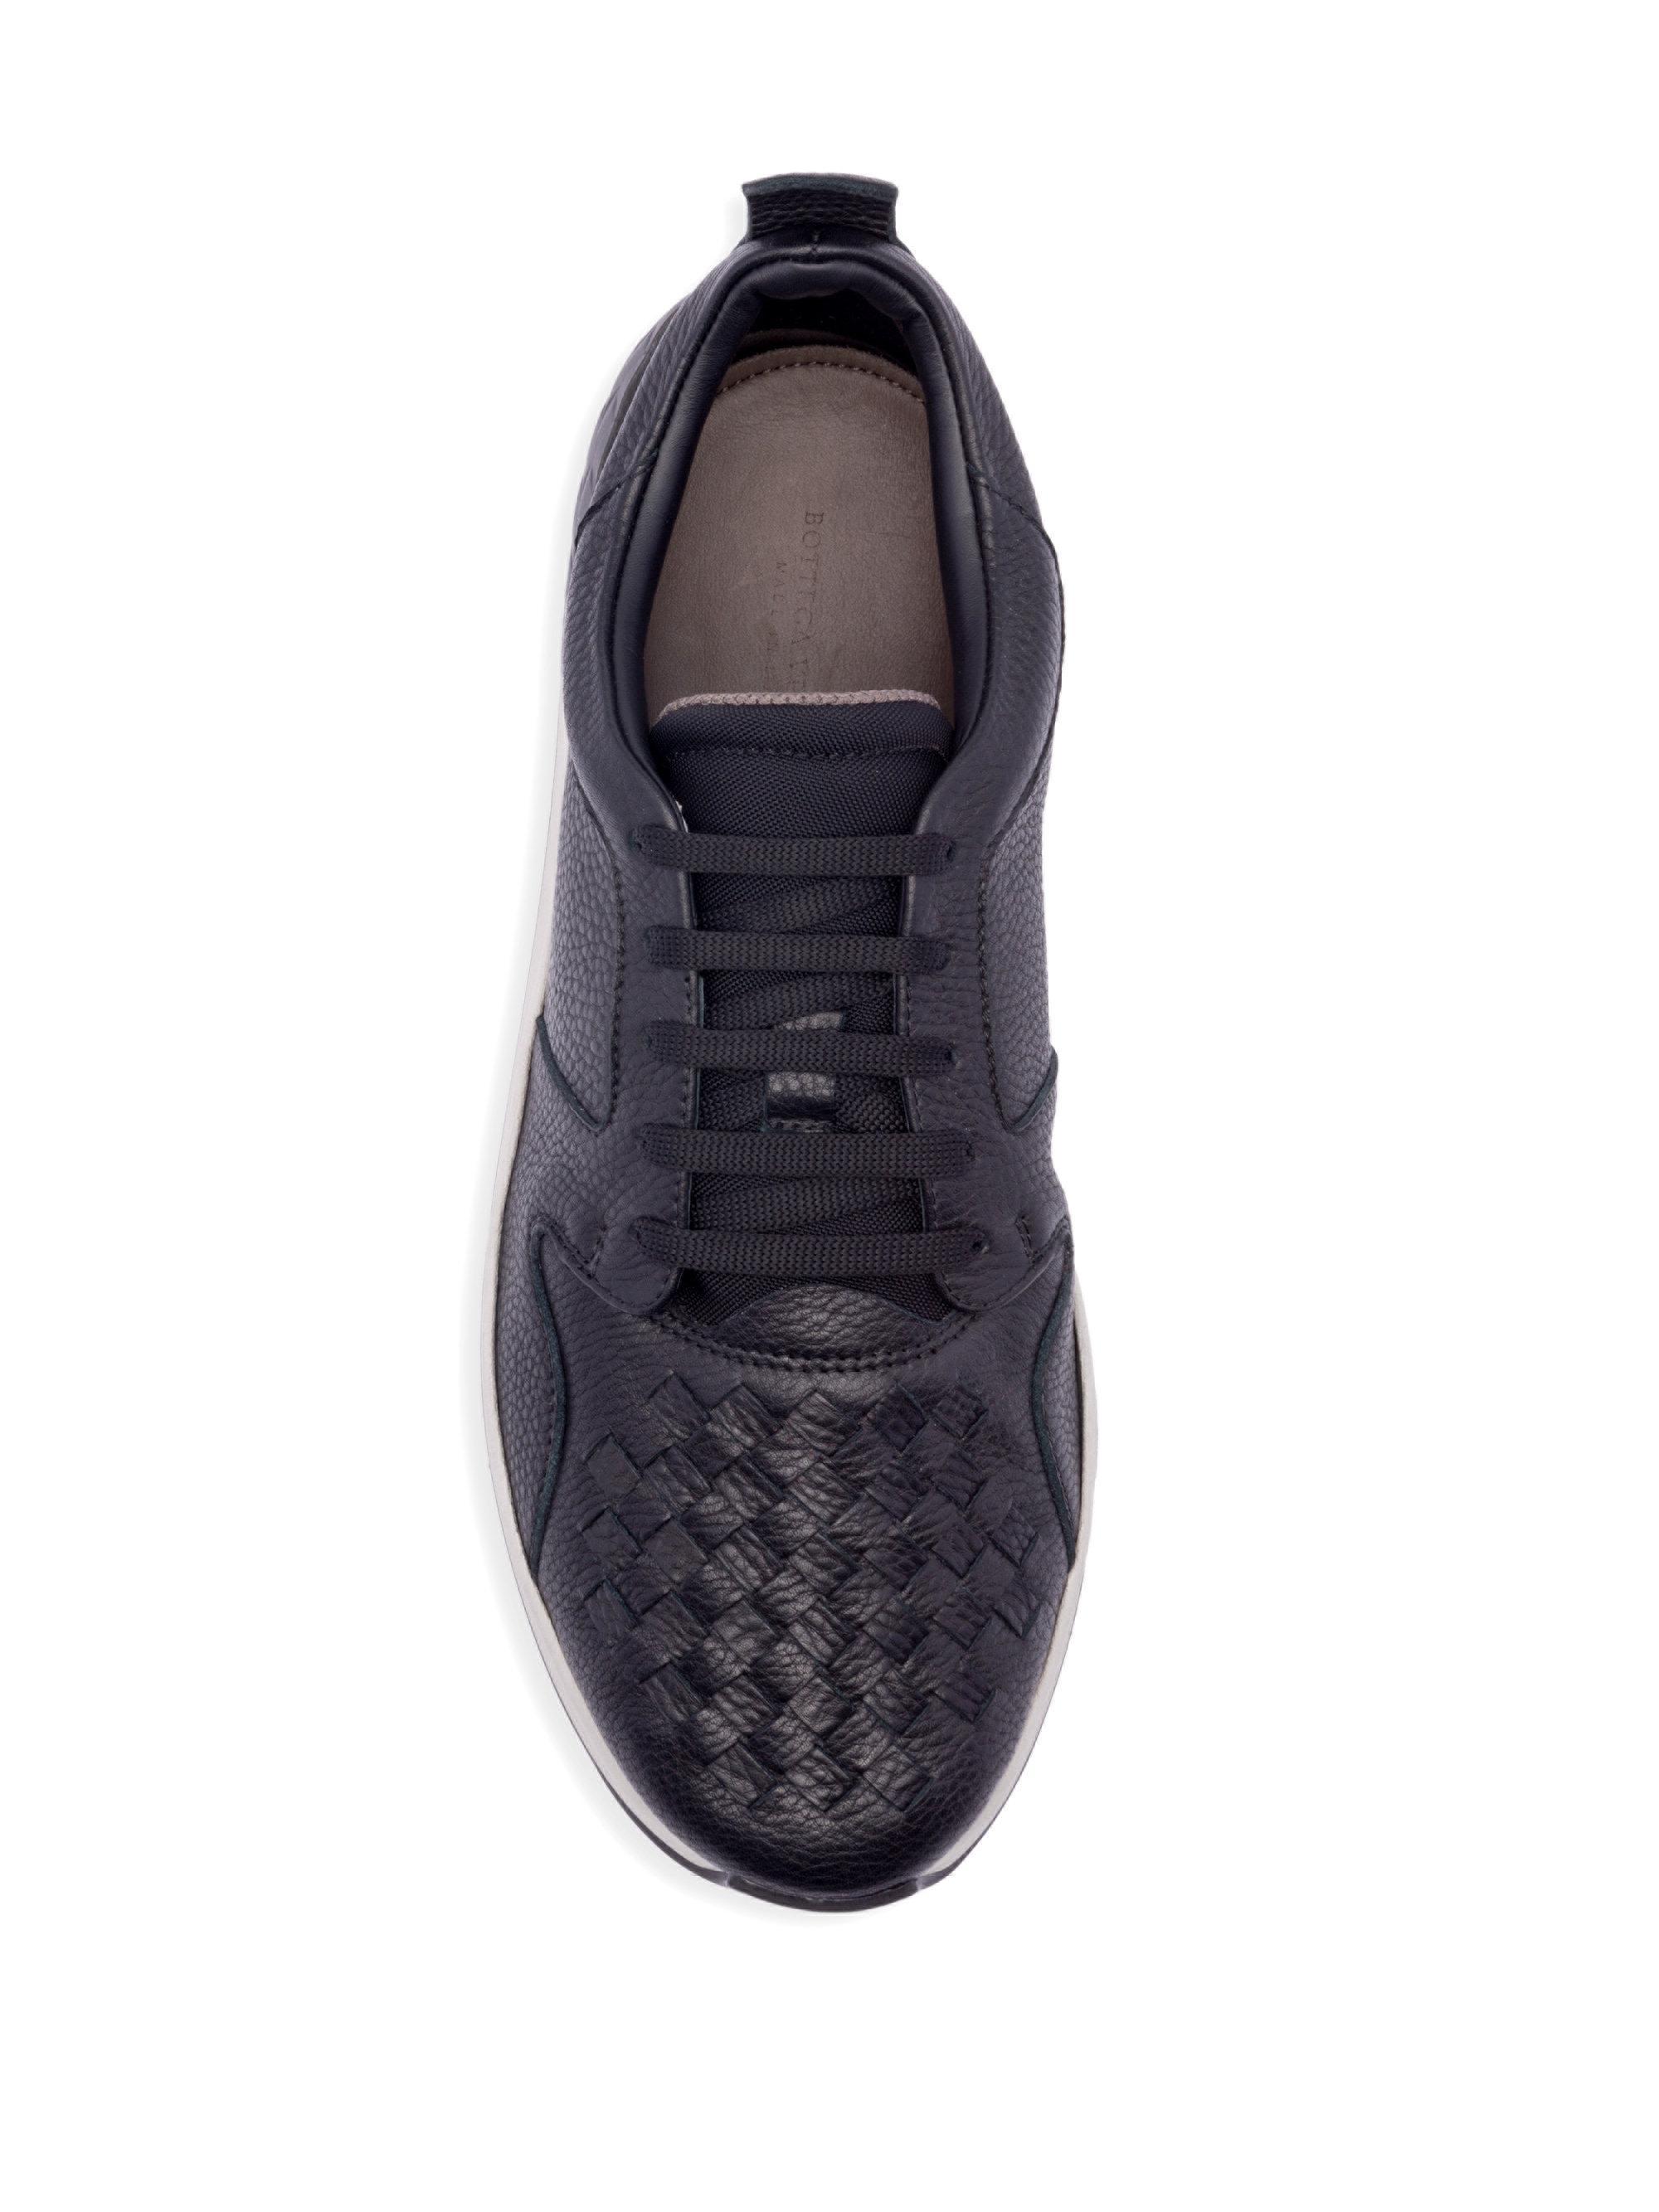 Bottega VenetaInterwoven Leather Low-Top Sneakers gXcVU4aF